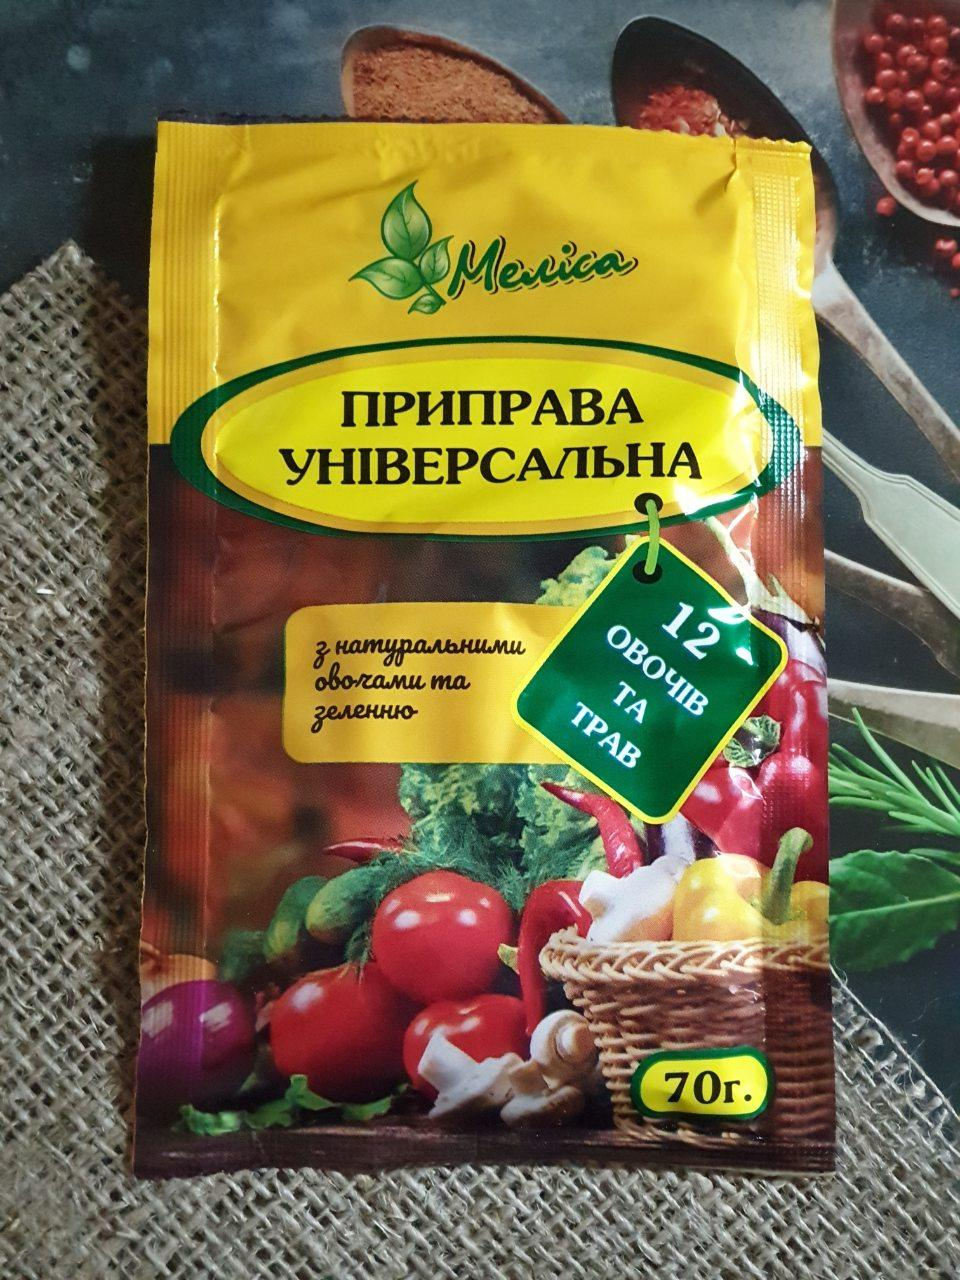 "Приправа 12 трав и овощей  70 гр ""Мелисса"""